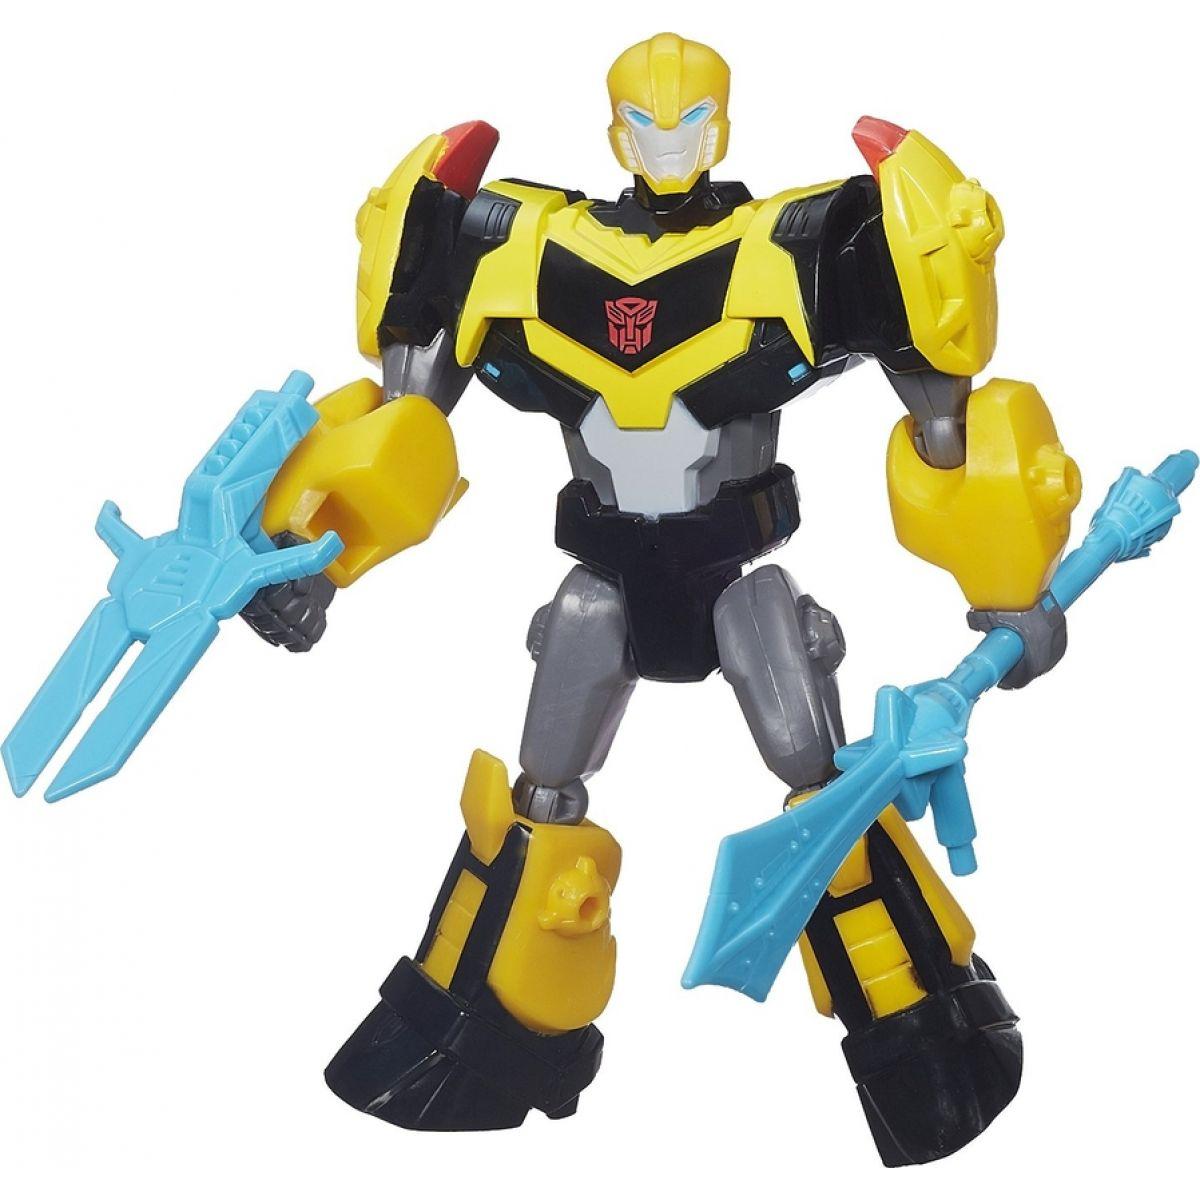 Hasbro Transformers Hero Mashers Transformer 15 cm - Bumblebee